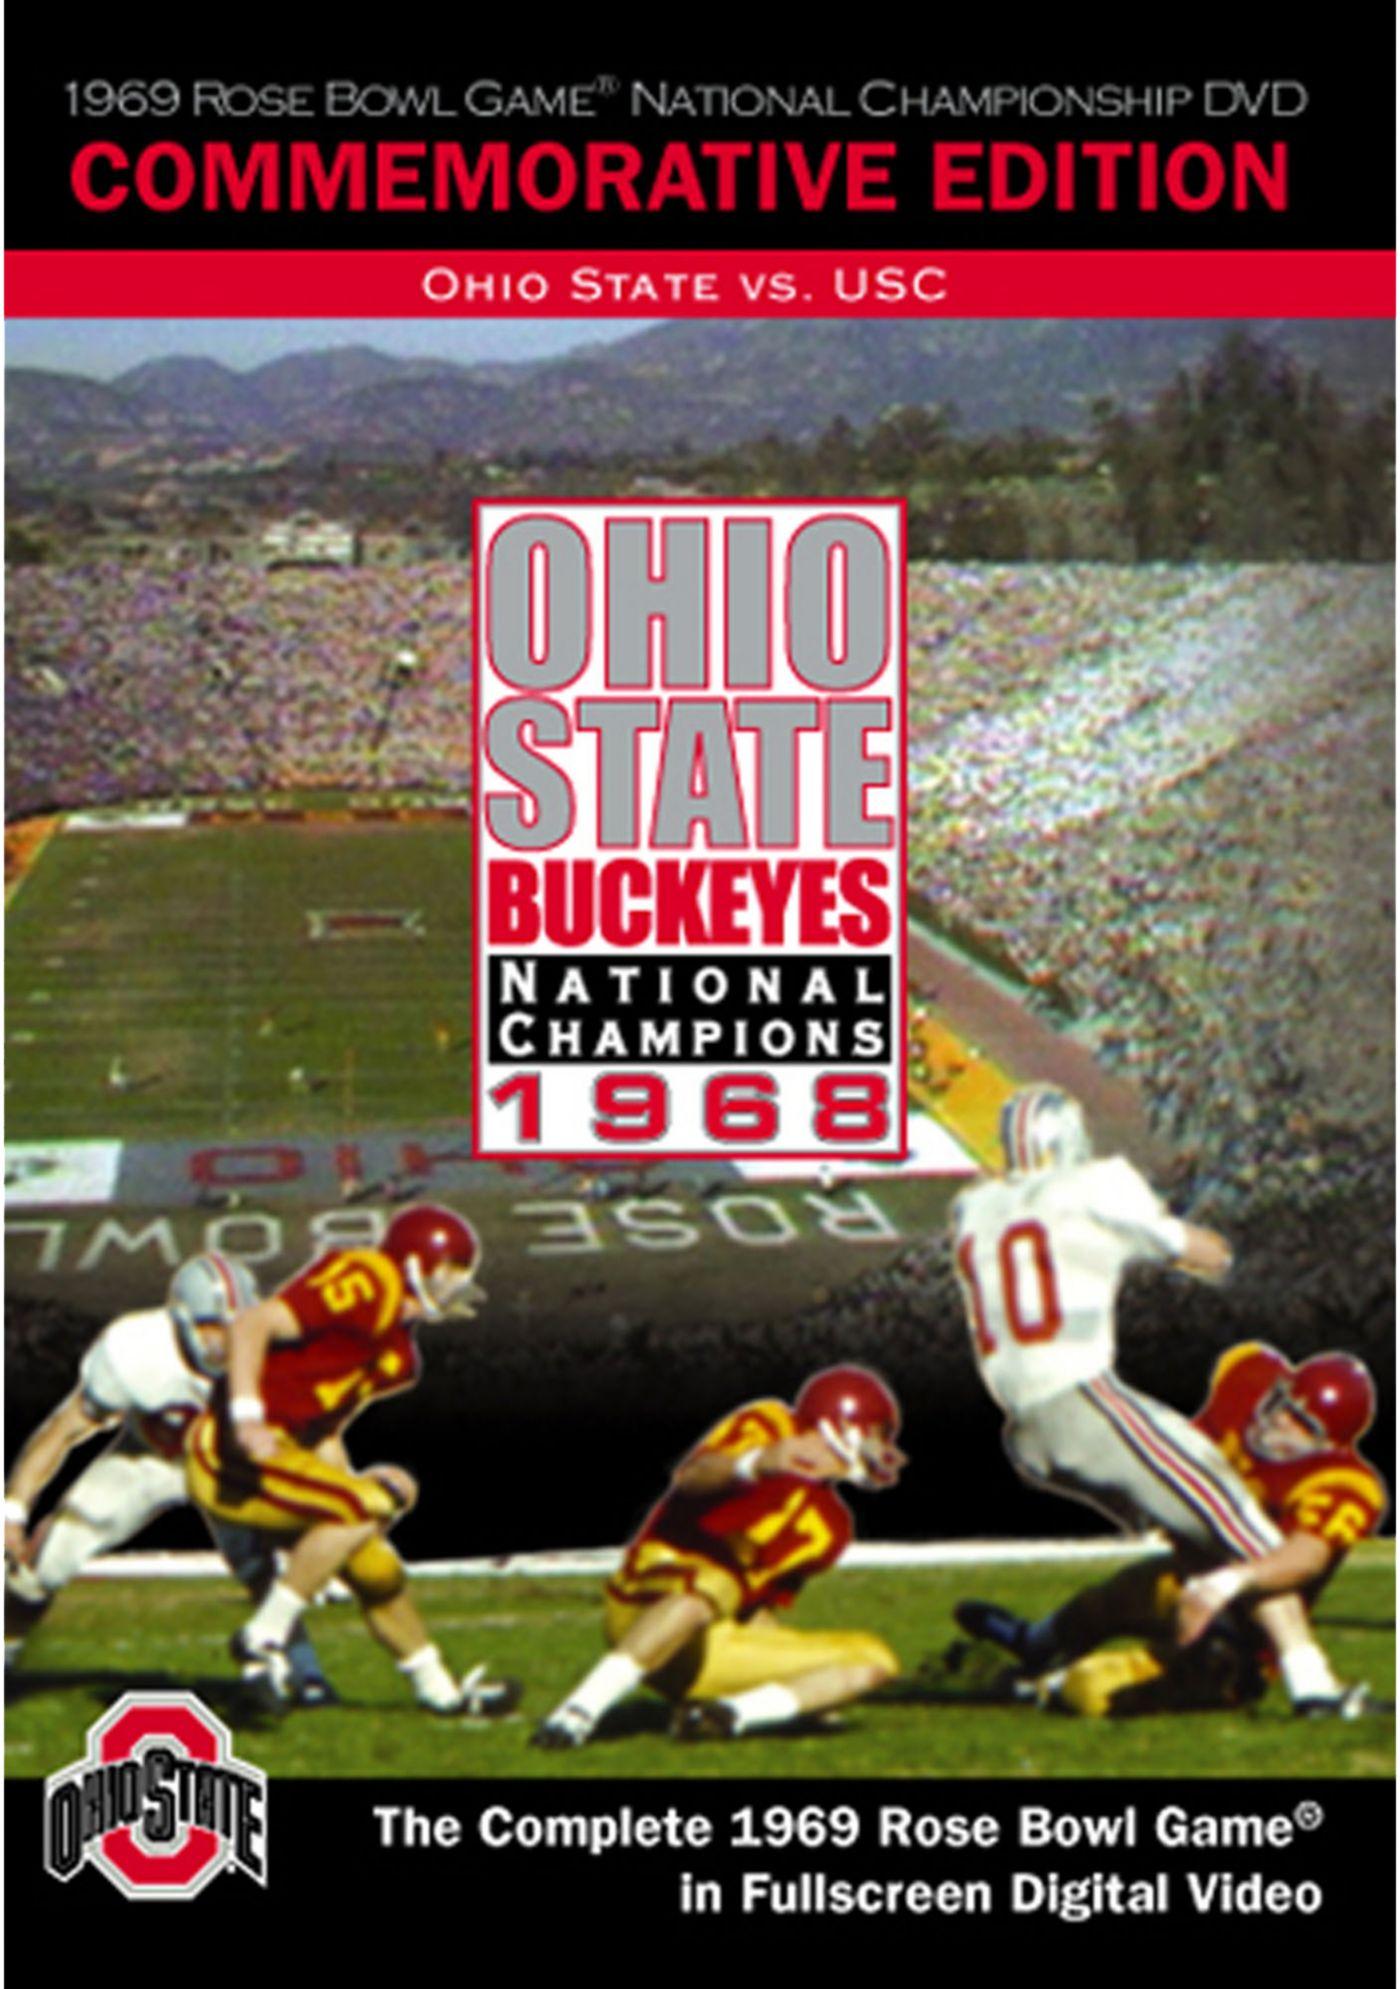 1969 Rose Bowl Game: Ohio State Buckeyes vs. USC Trojans DVD